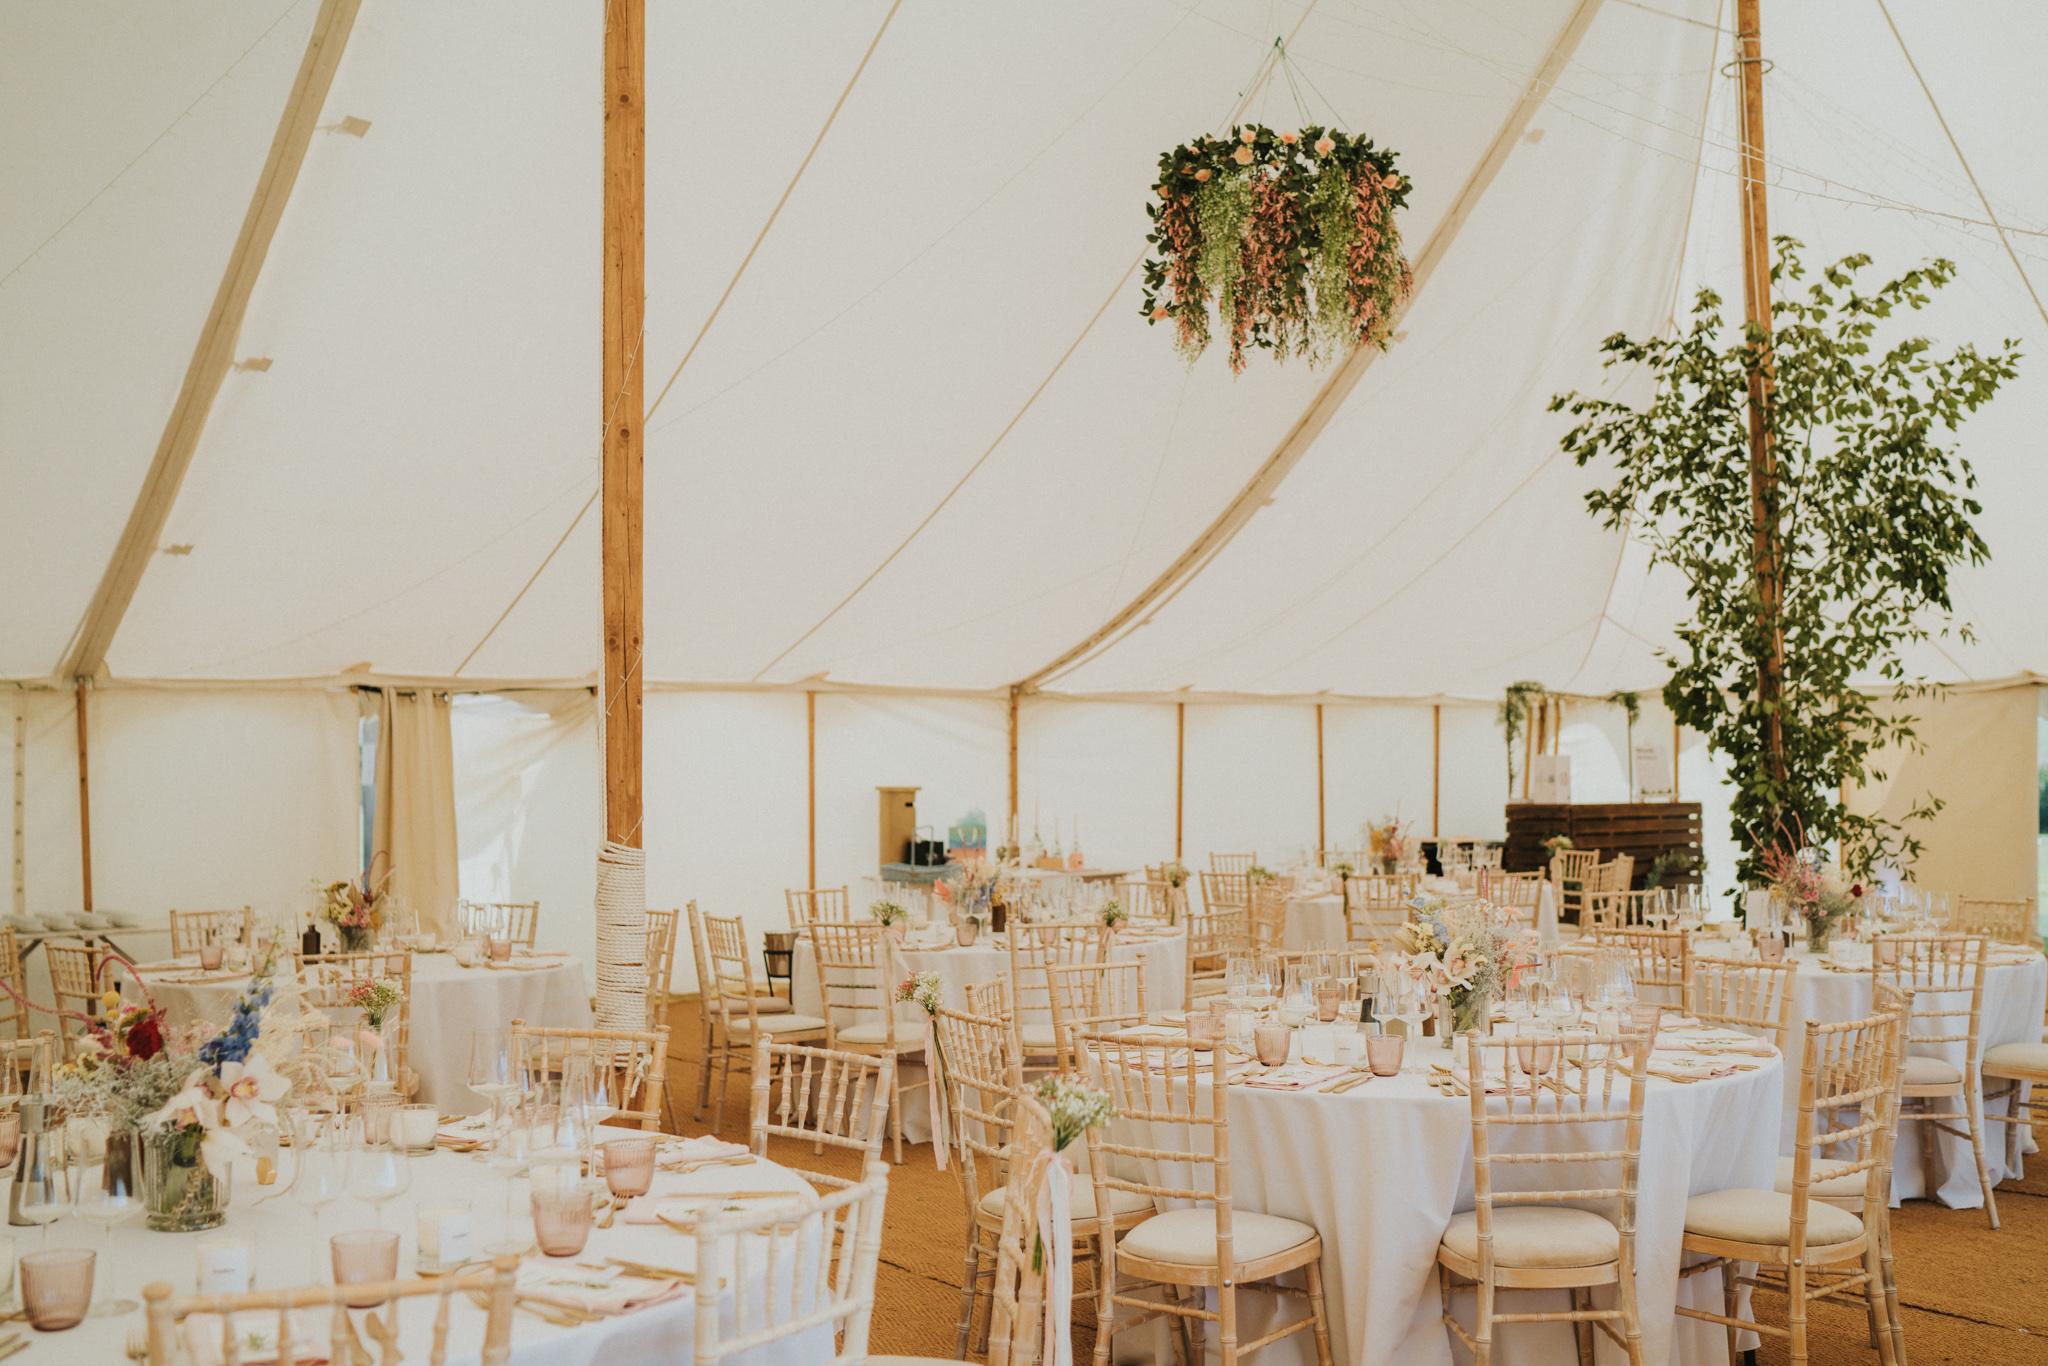 emi-Jack-boho-diy-wedding-eggington-house-grace-elizabeth-colchester-essex-alternative-wedding-photographer-suffolk-norfolk-devon (24 of 56).jpg